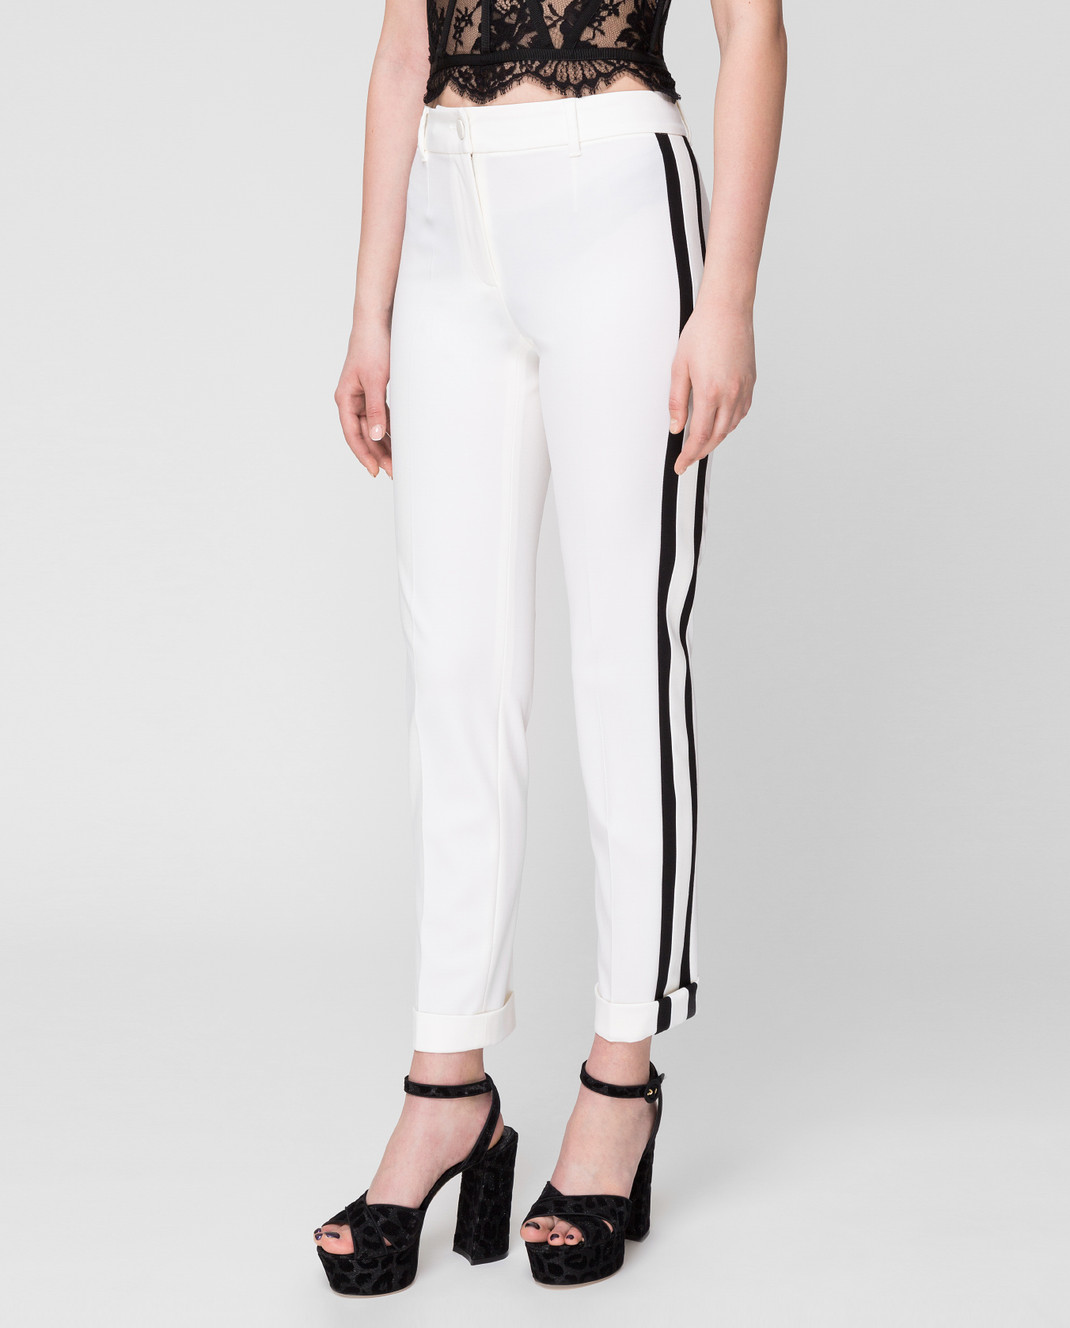 Dolce&Gabbana Белые брюки FTBDETFUCCS изображение 3